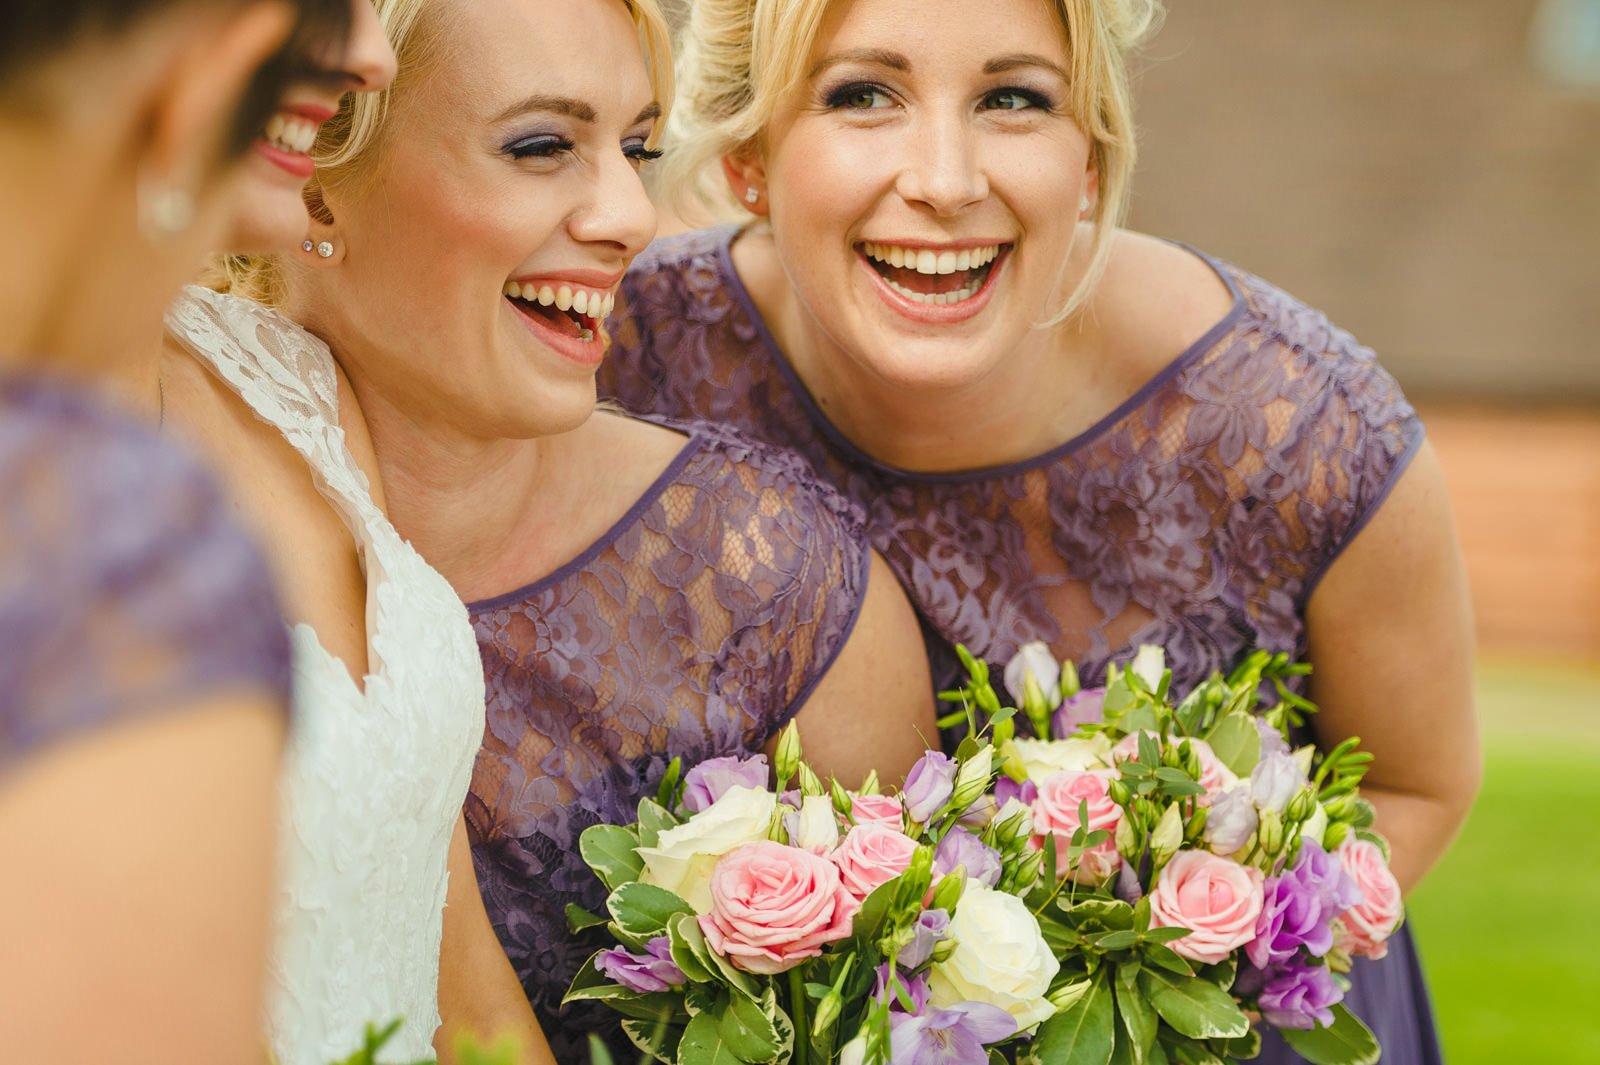 Millers Of Netley wedding, Dorrington, Shrewsbury | Emma + Ben 64